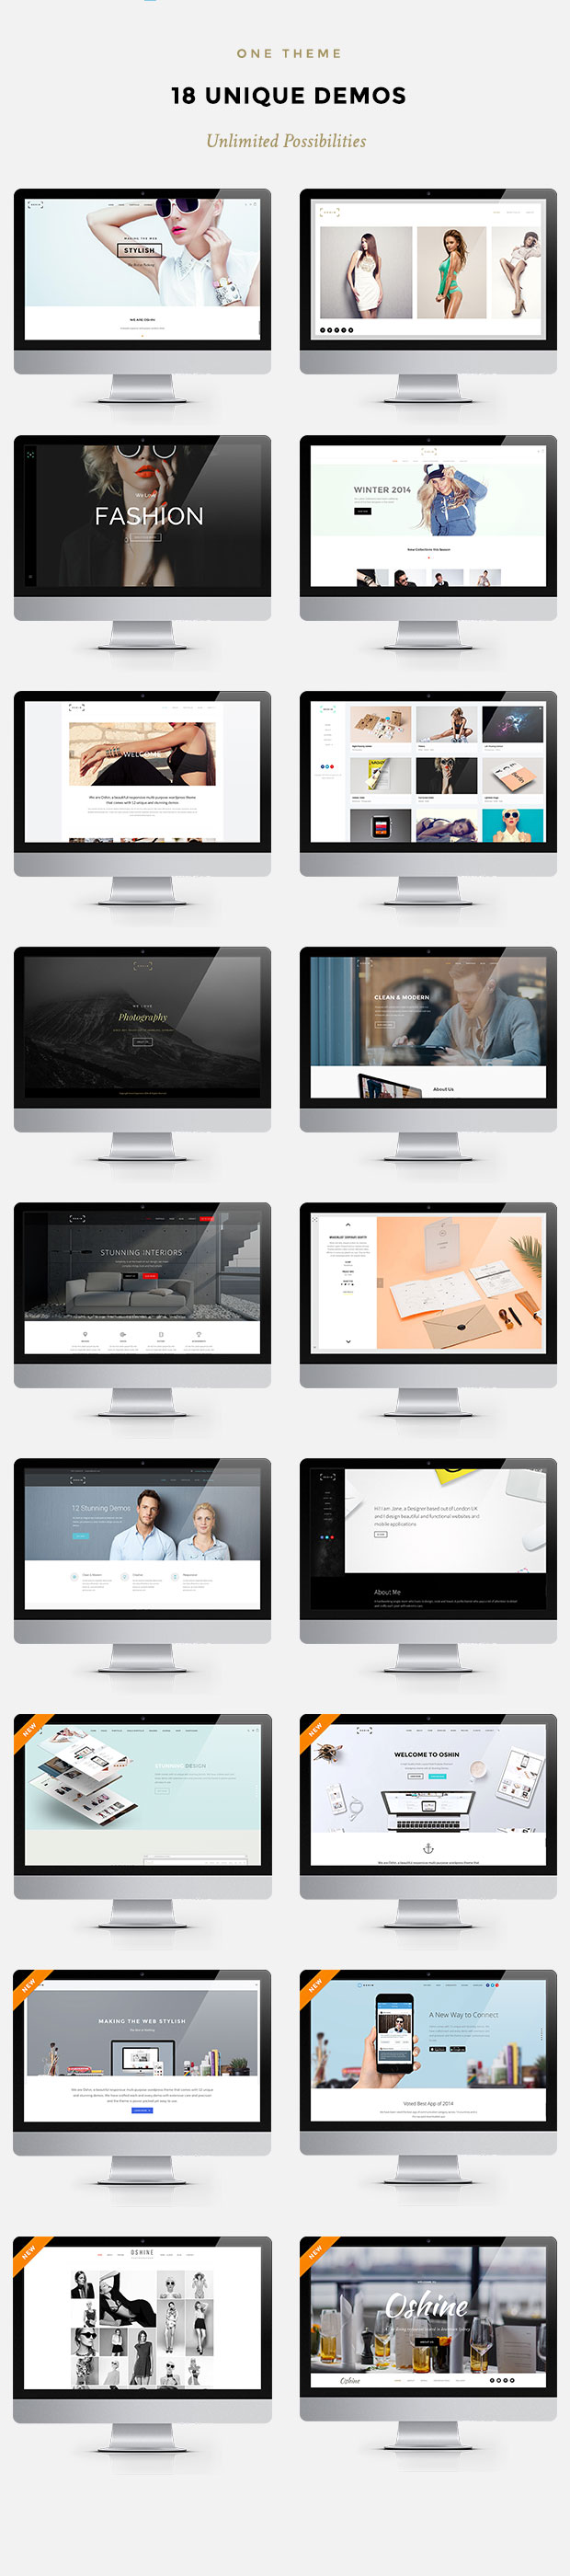 Oshine - Creative Multi-Purpose HTML Template | Purpose and Creative